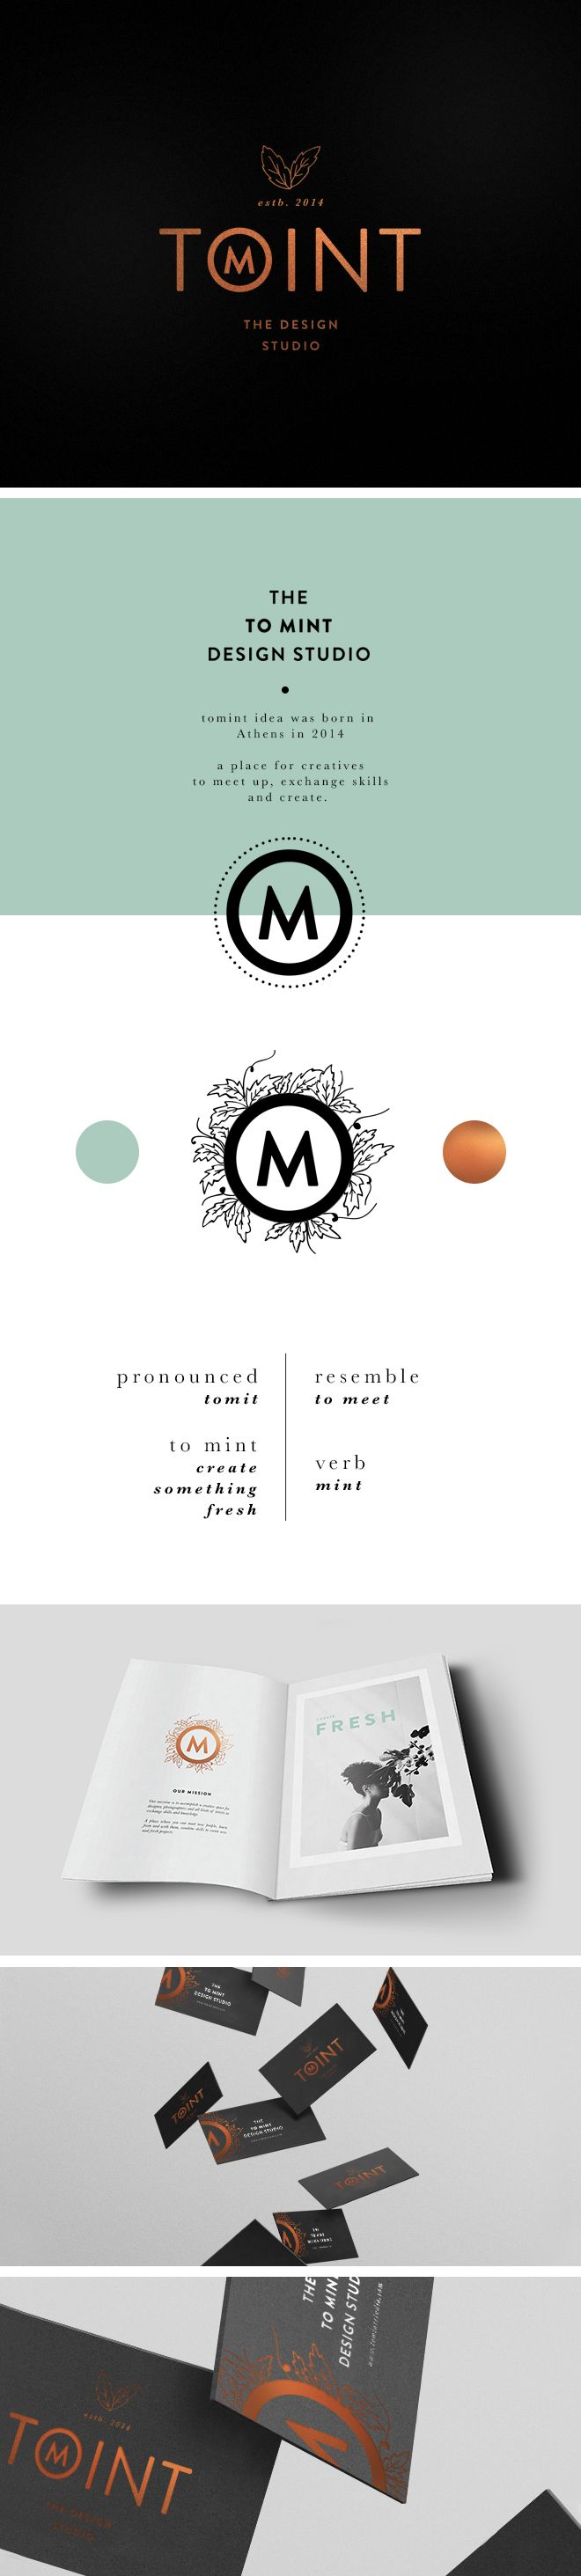 NEW IN PORTFOLIO: TOMINT DESIGN STUDIO  Brand Identity  http://www.cocorrina.com/2014/06/new-in-portfolio-tomint-design-studio.html